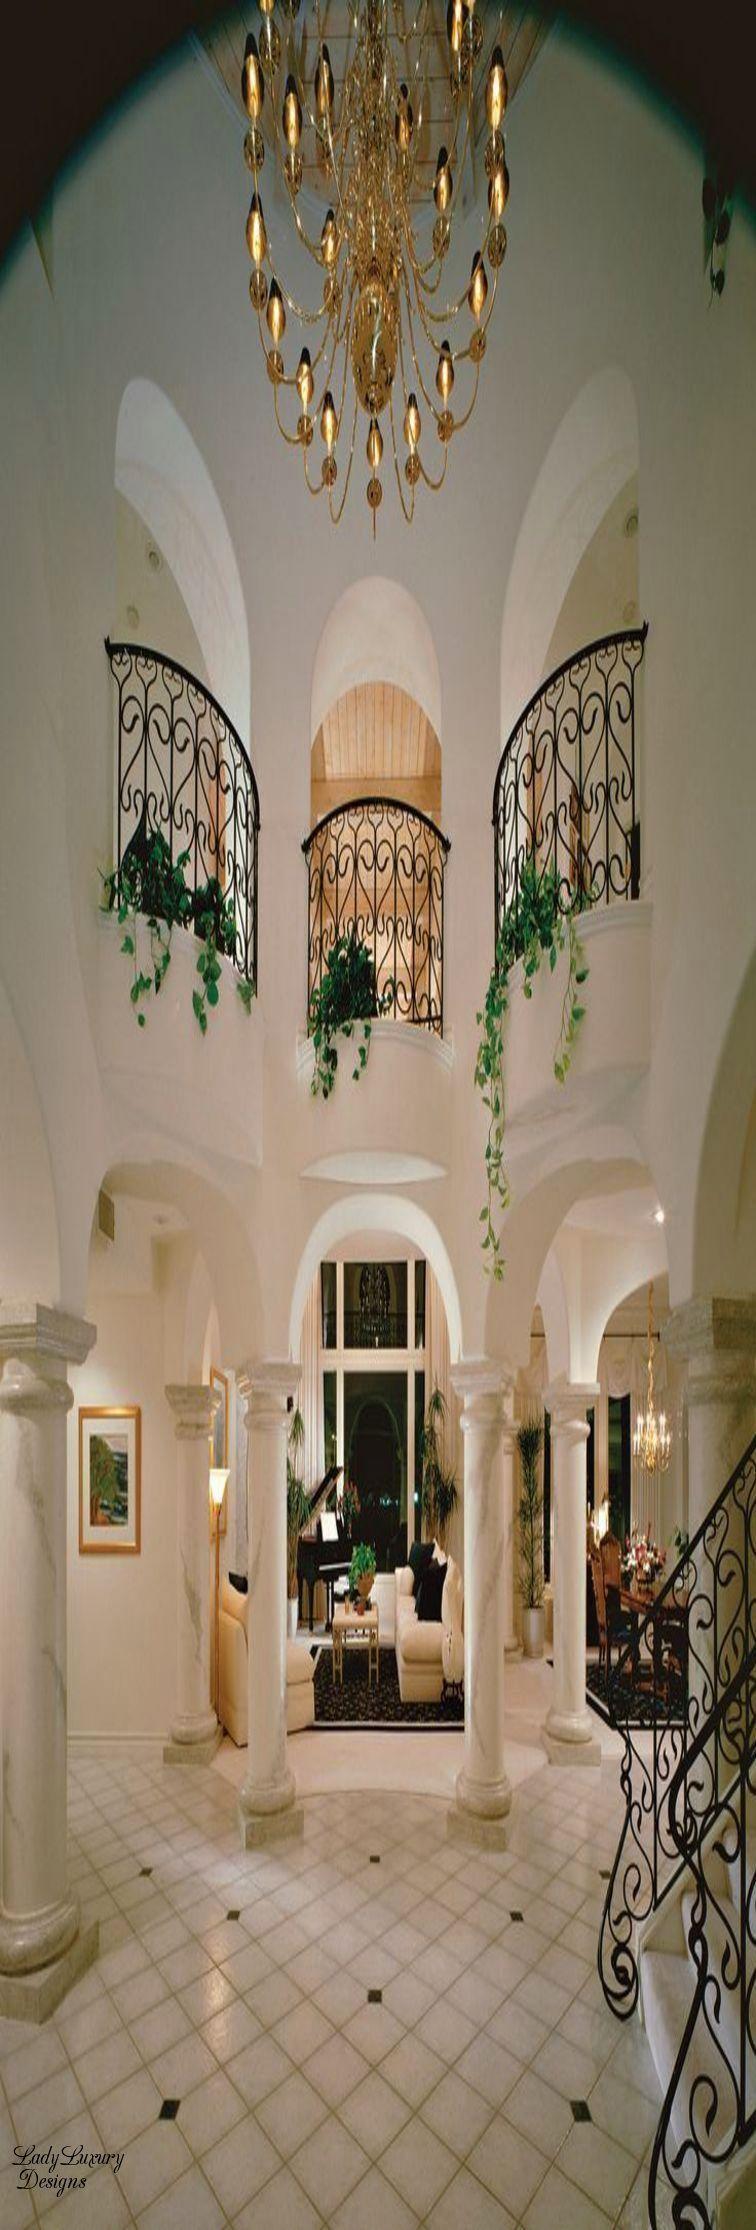 million dollar interiors ladyluxurydesigns dream homes million dollar interiors ladyluxurydesigns entrance foyergrand entranceluxury homes